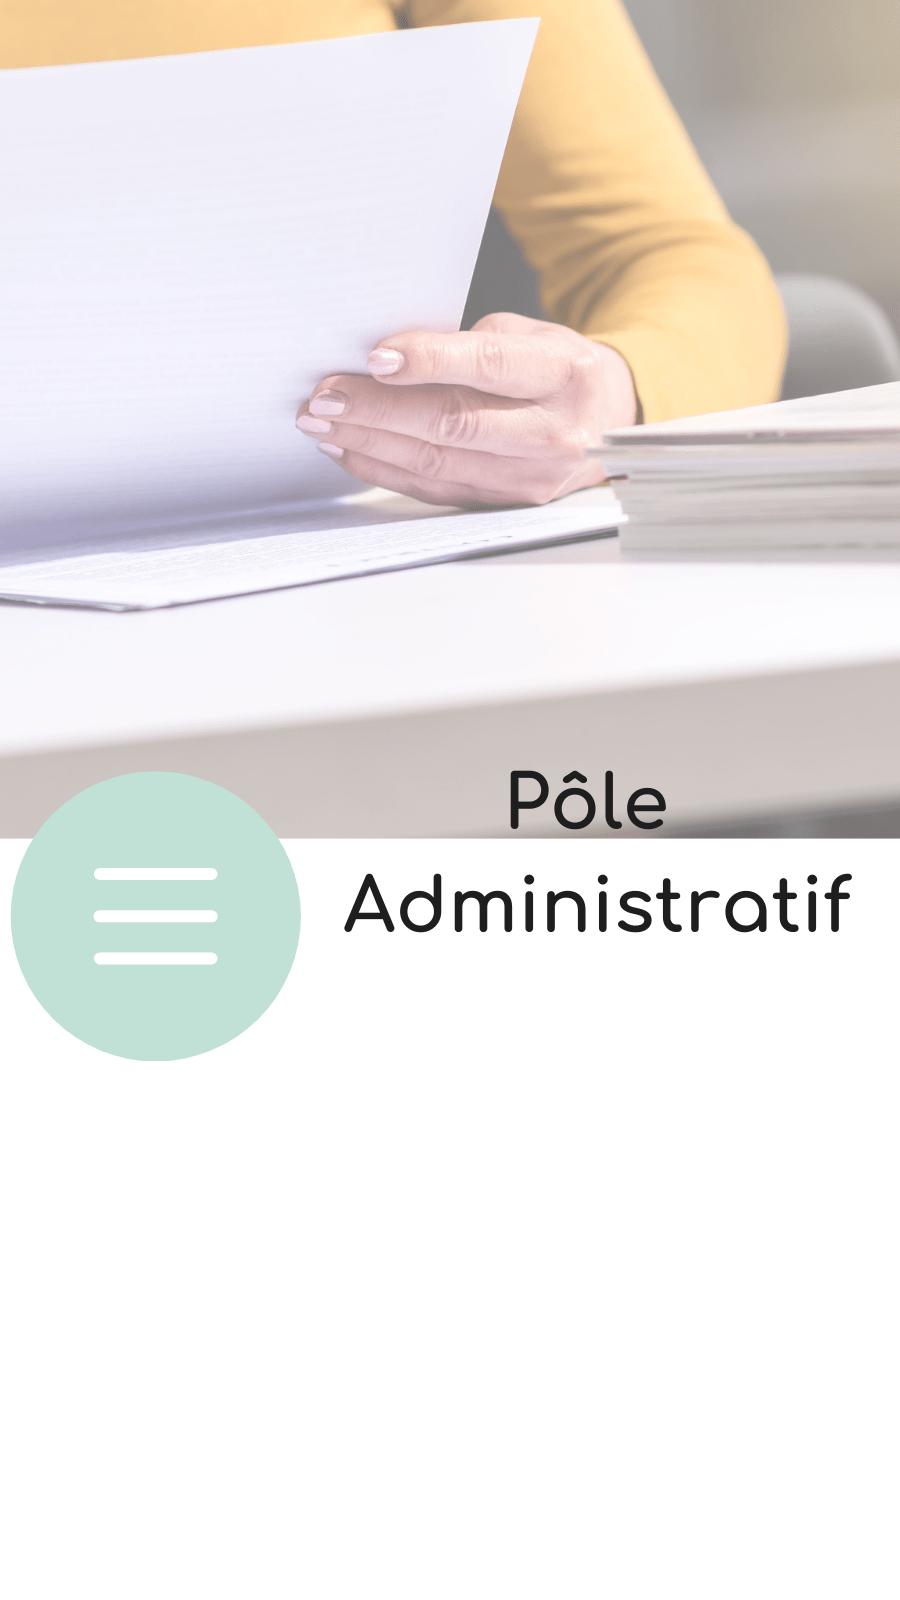 offre-pole-administratif-entreprise-gestion-back-office